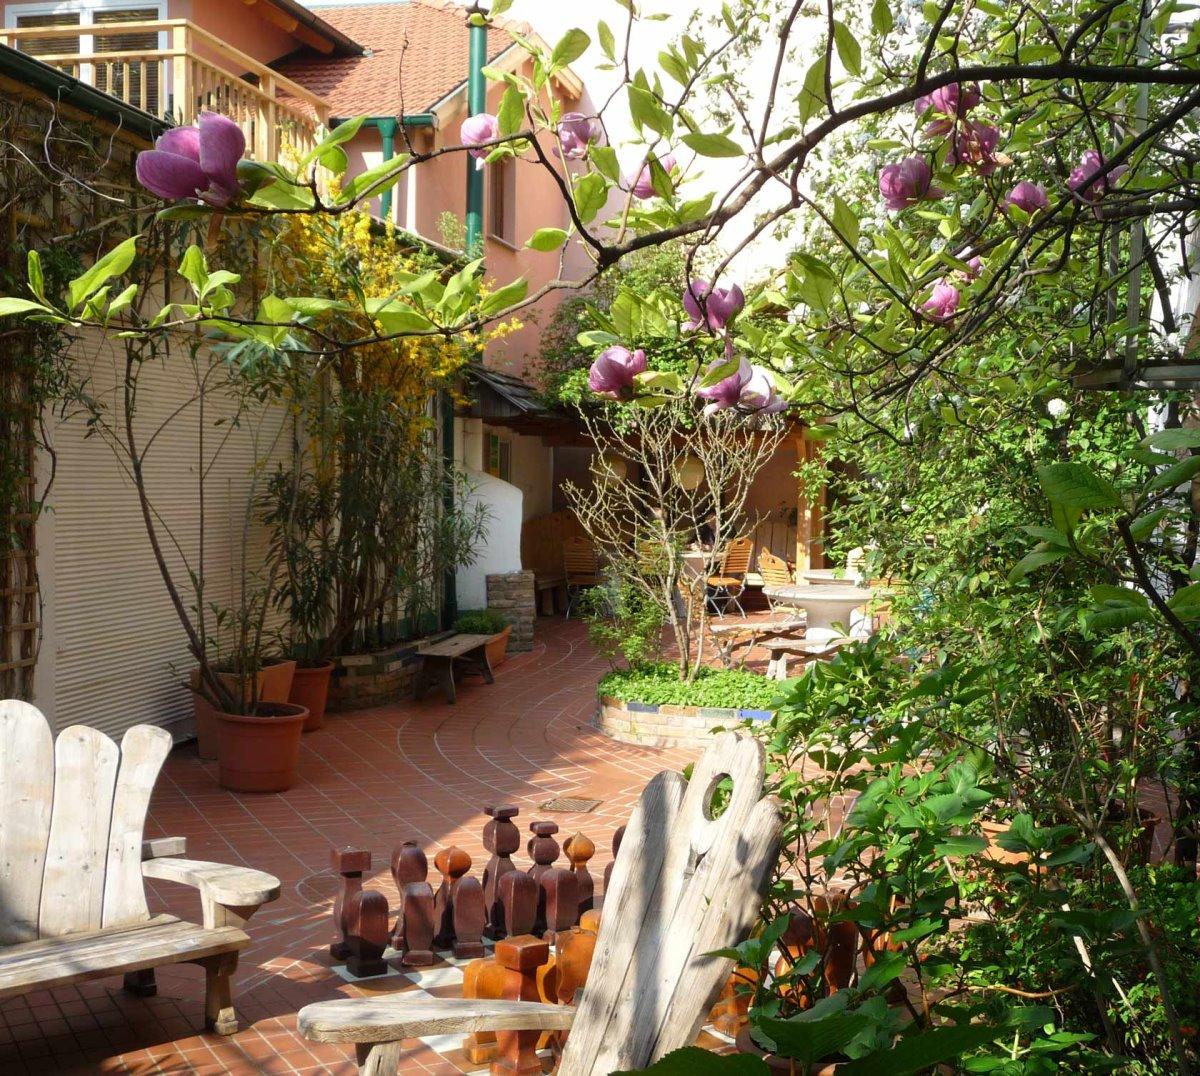 Hostel κήπος